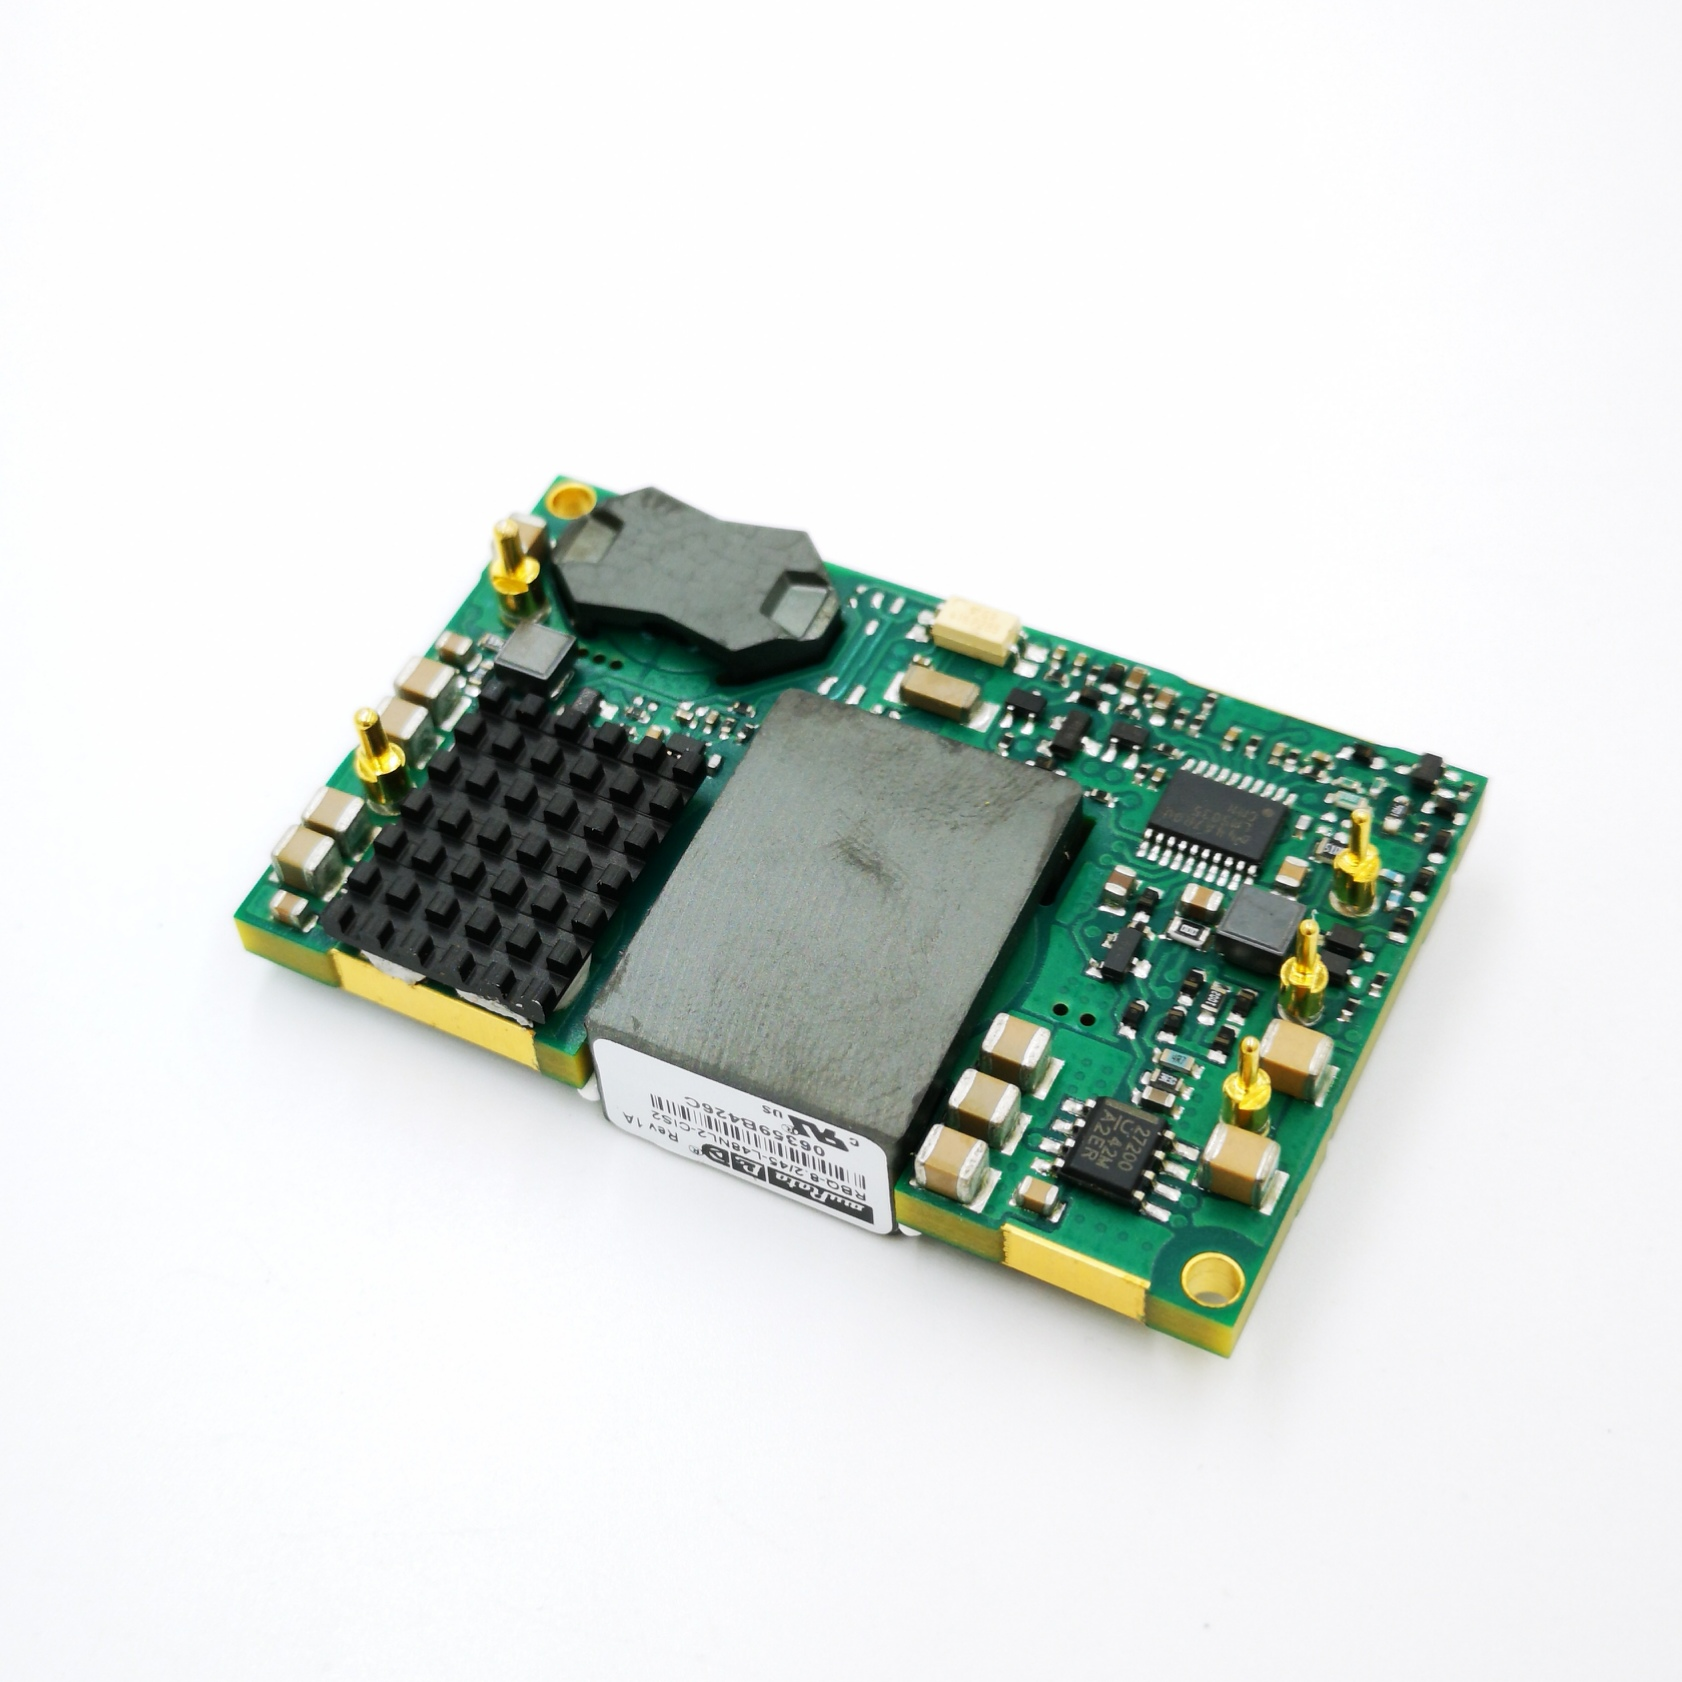 Consumer Electronics Discreet 12v 24v 36v 48v 60v 50a 25a 30a Fast Charger Speed Quick For Lto Battery Lithium Titanate Charger Rv Ev 0-60v 0-50a Adjustable